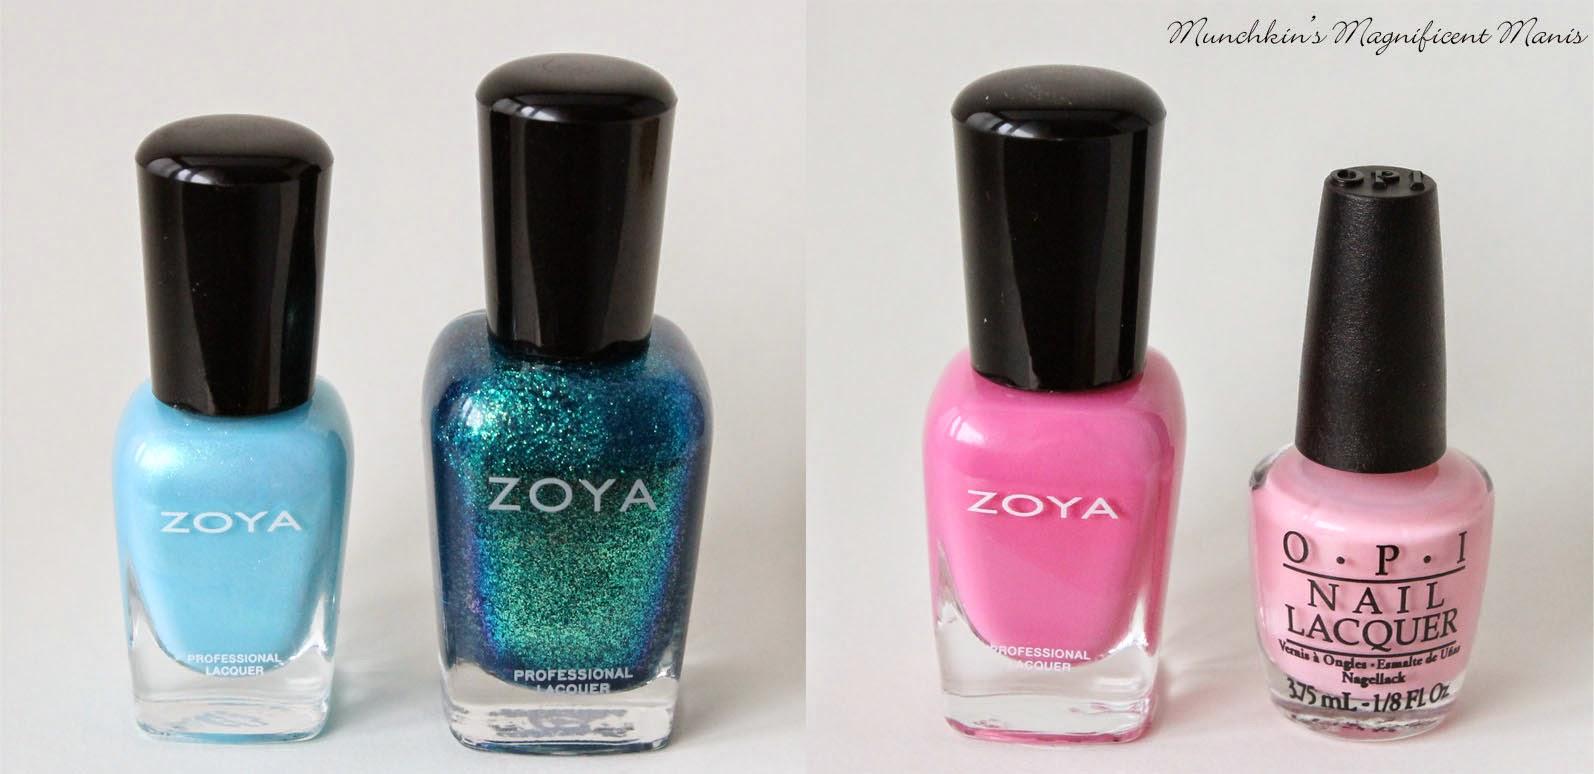 Zoya full size, Zoya mini, OPI mini